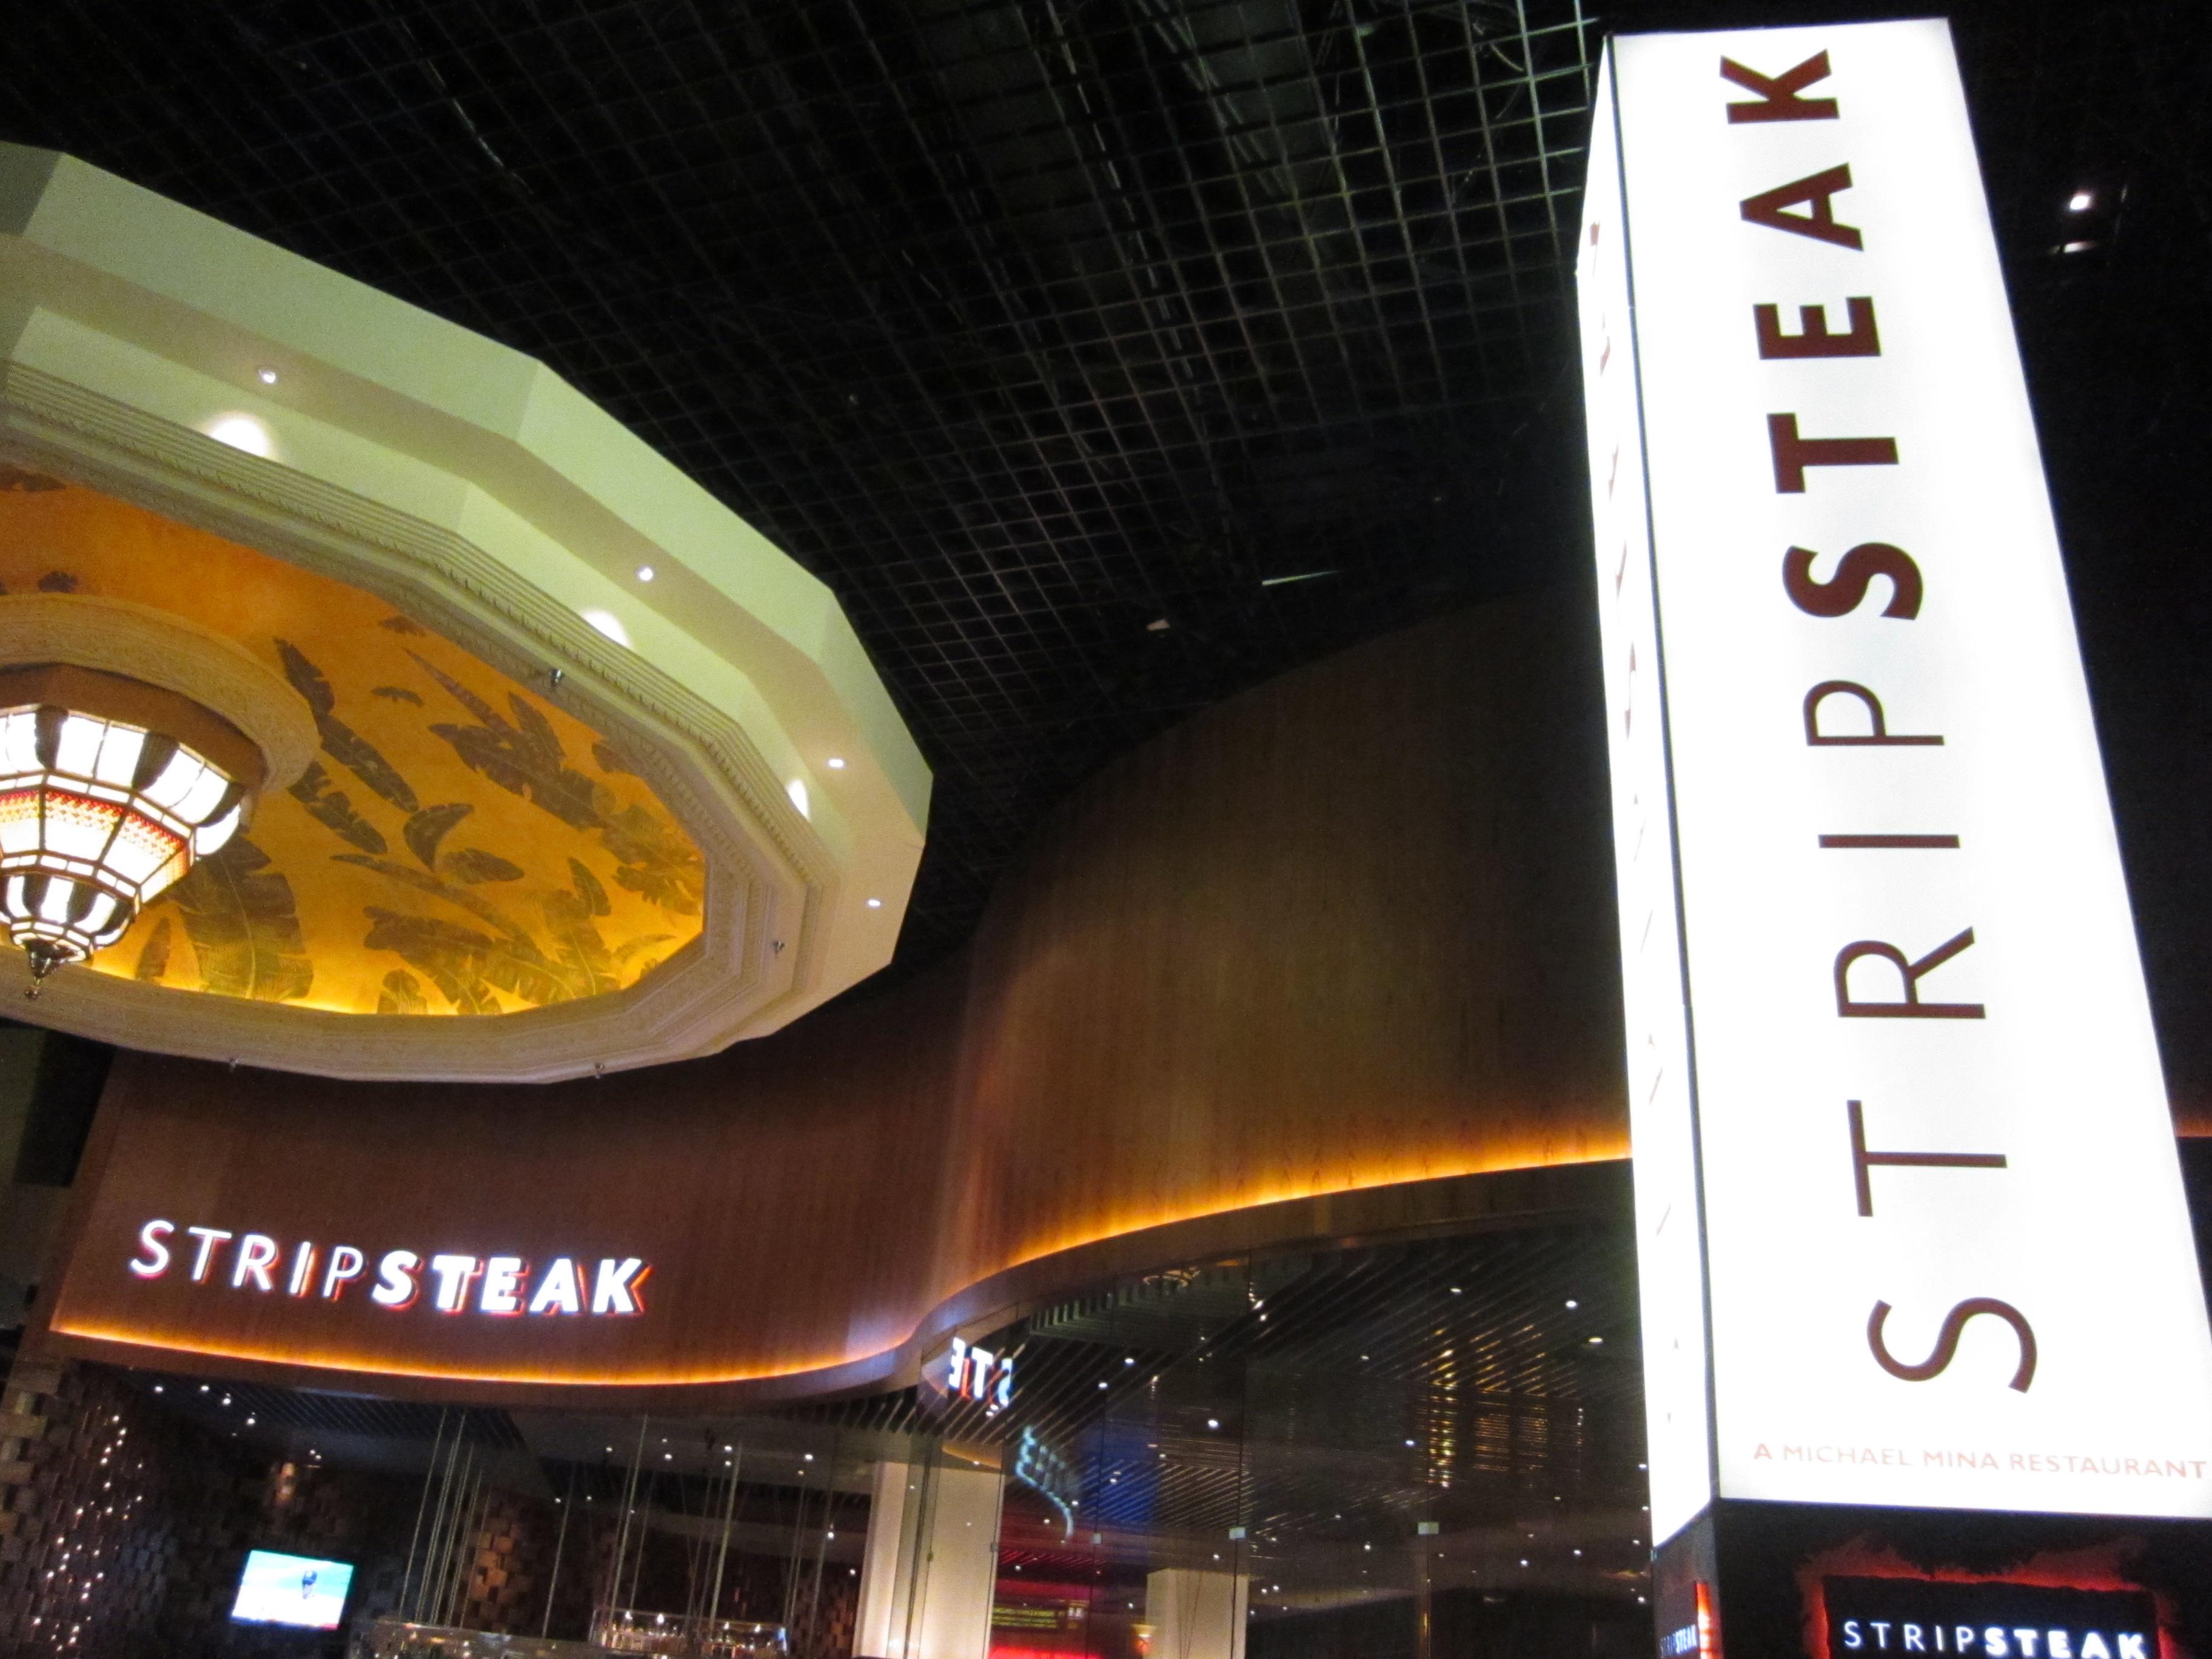 Strip steak at mandalay bay